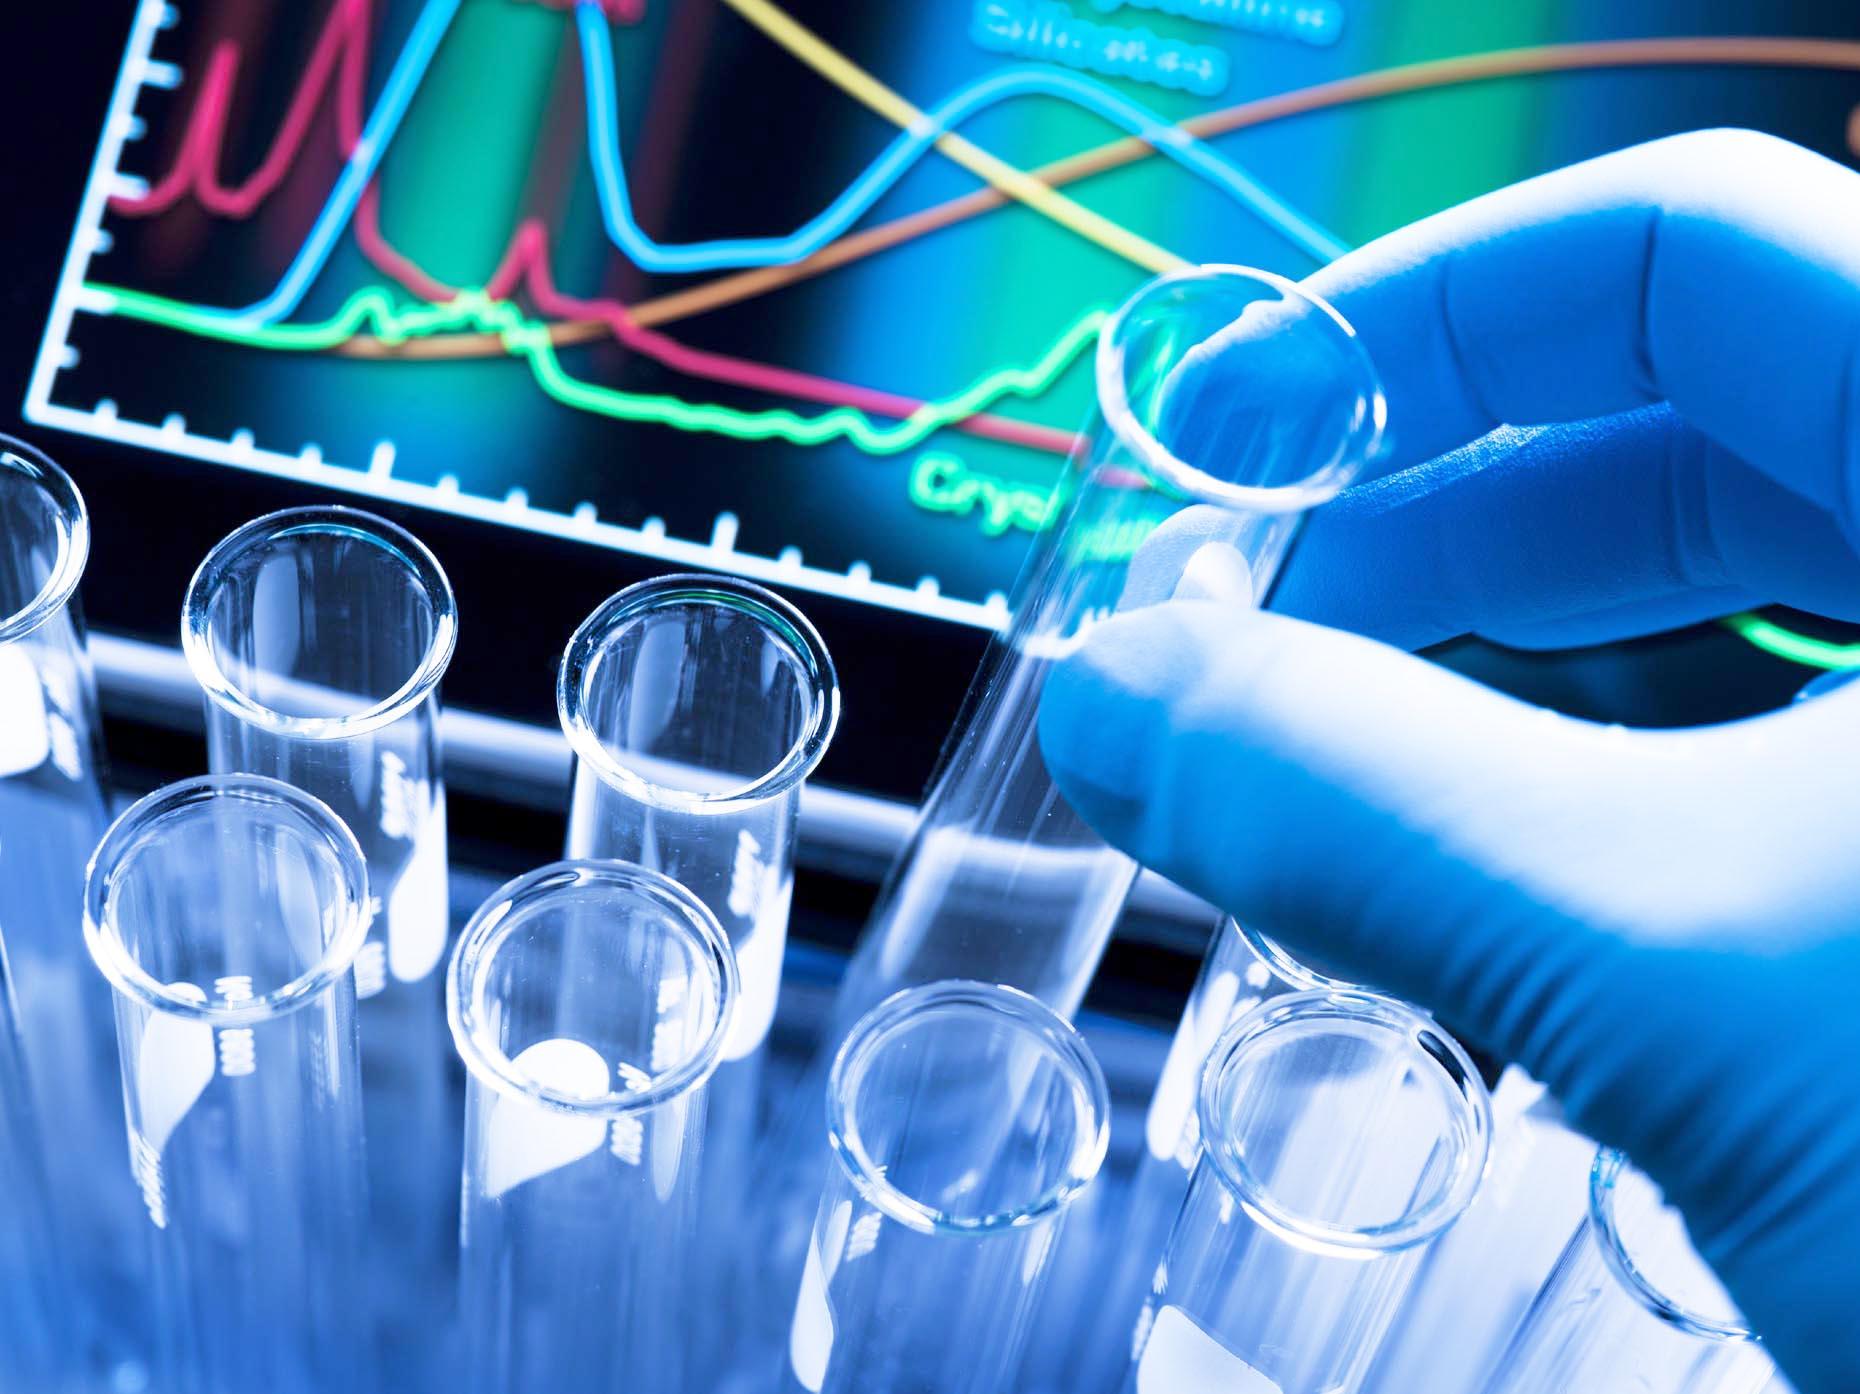 Test tube rack in a laboratory